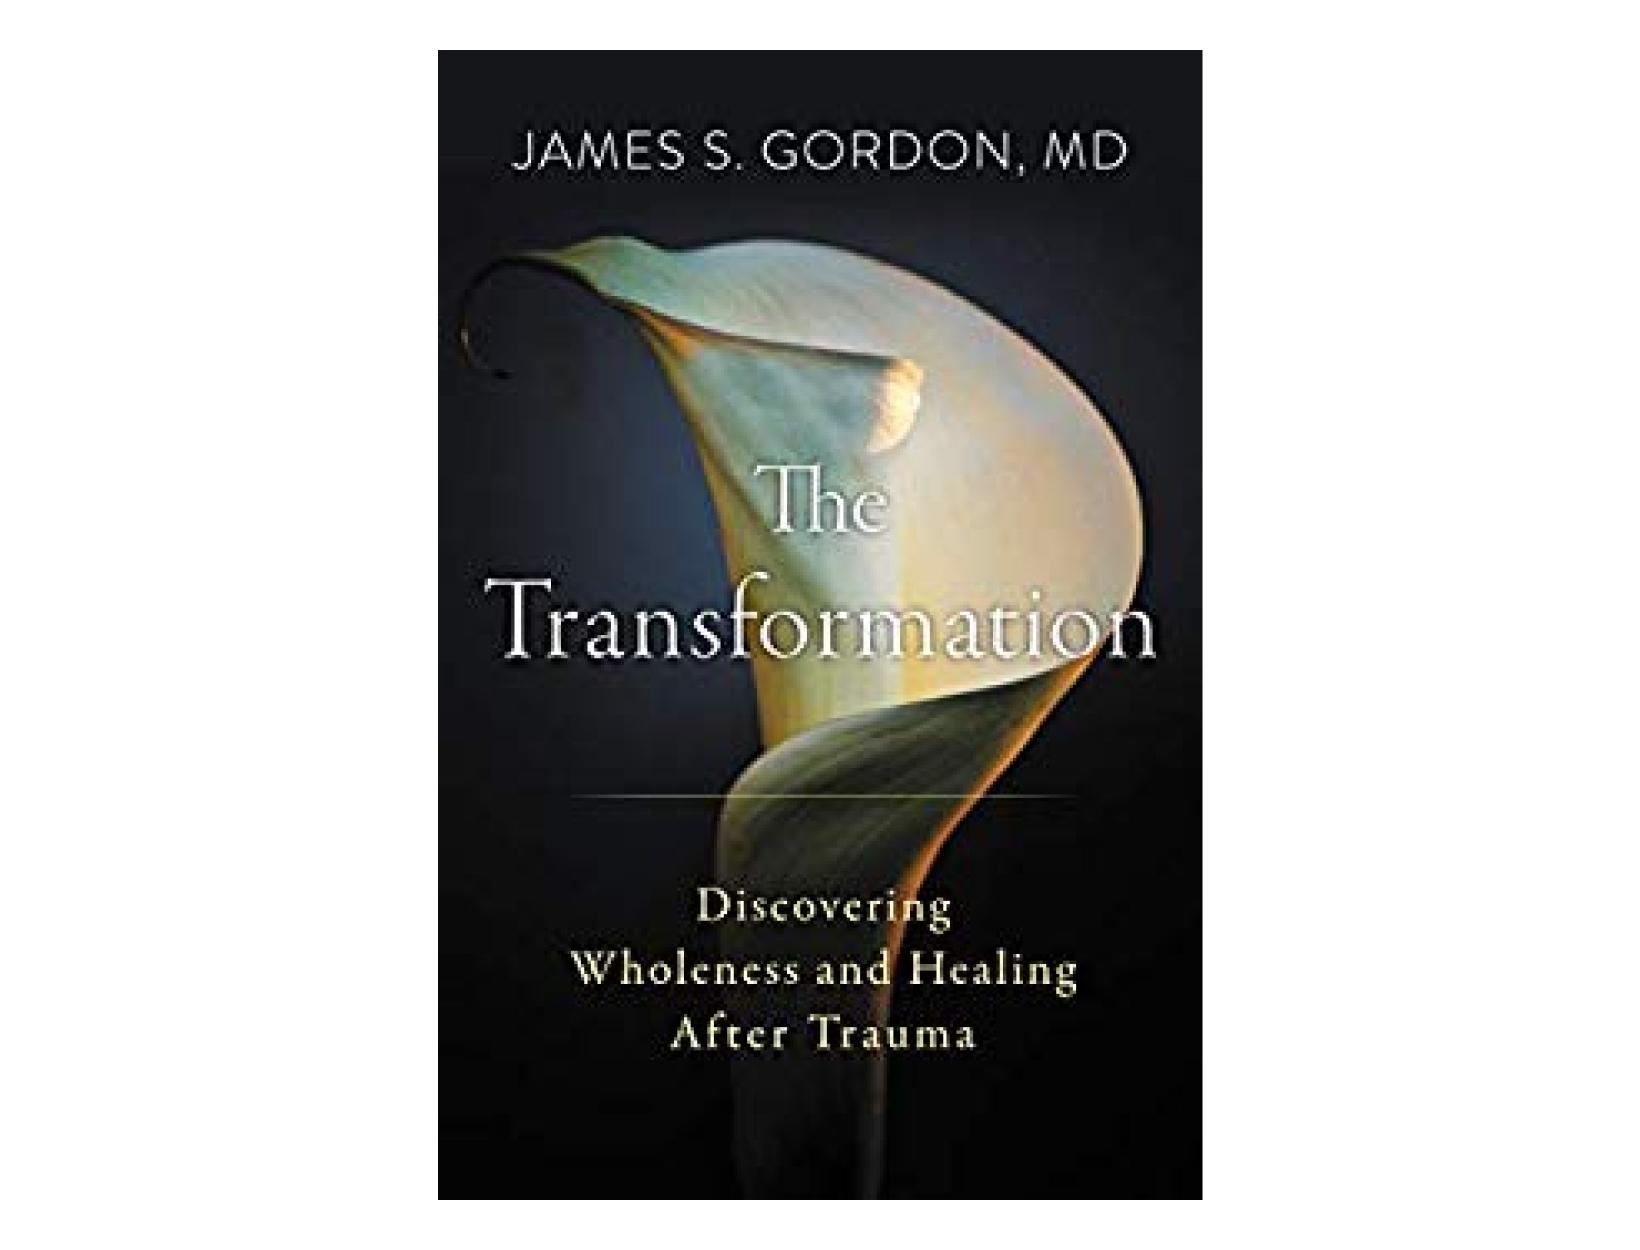 <em>The Transformation</em> by James Gordon, MD